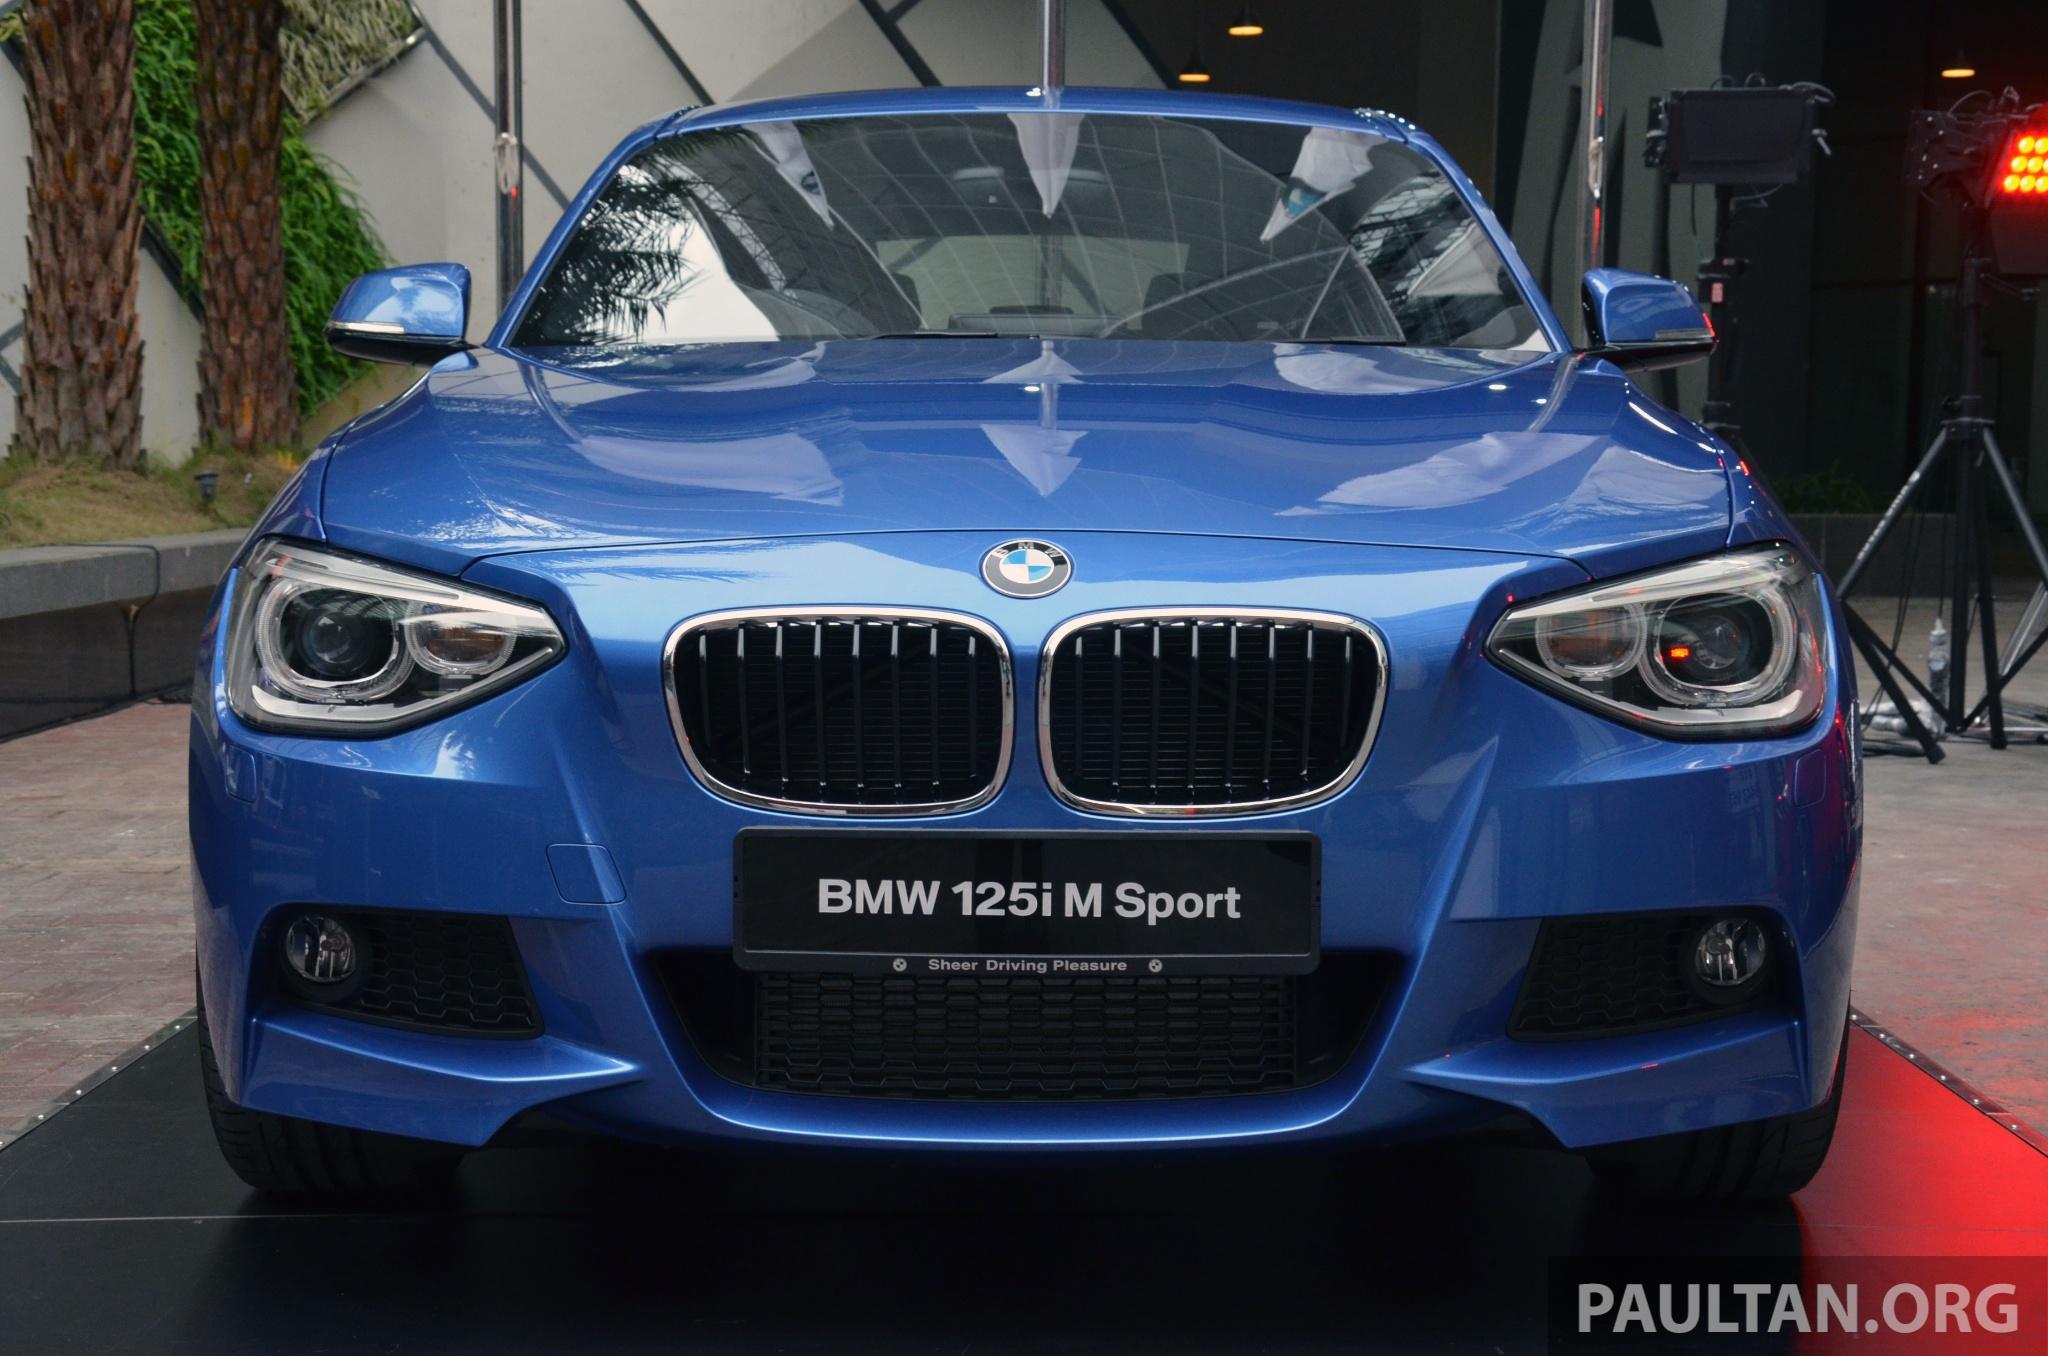 Bmw 125i m Sport Blue F20 Bmw 125i m Sport 4